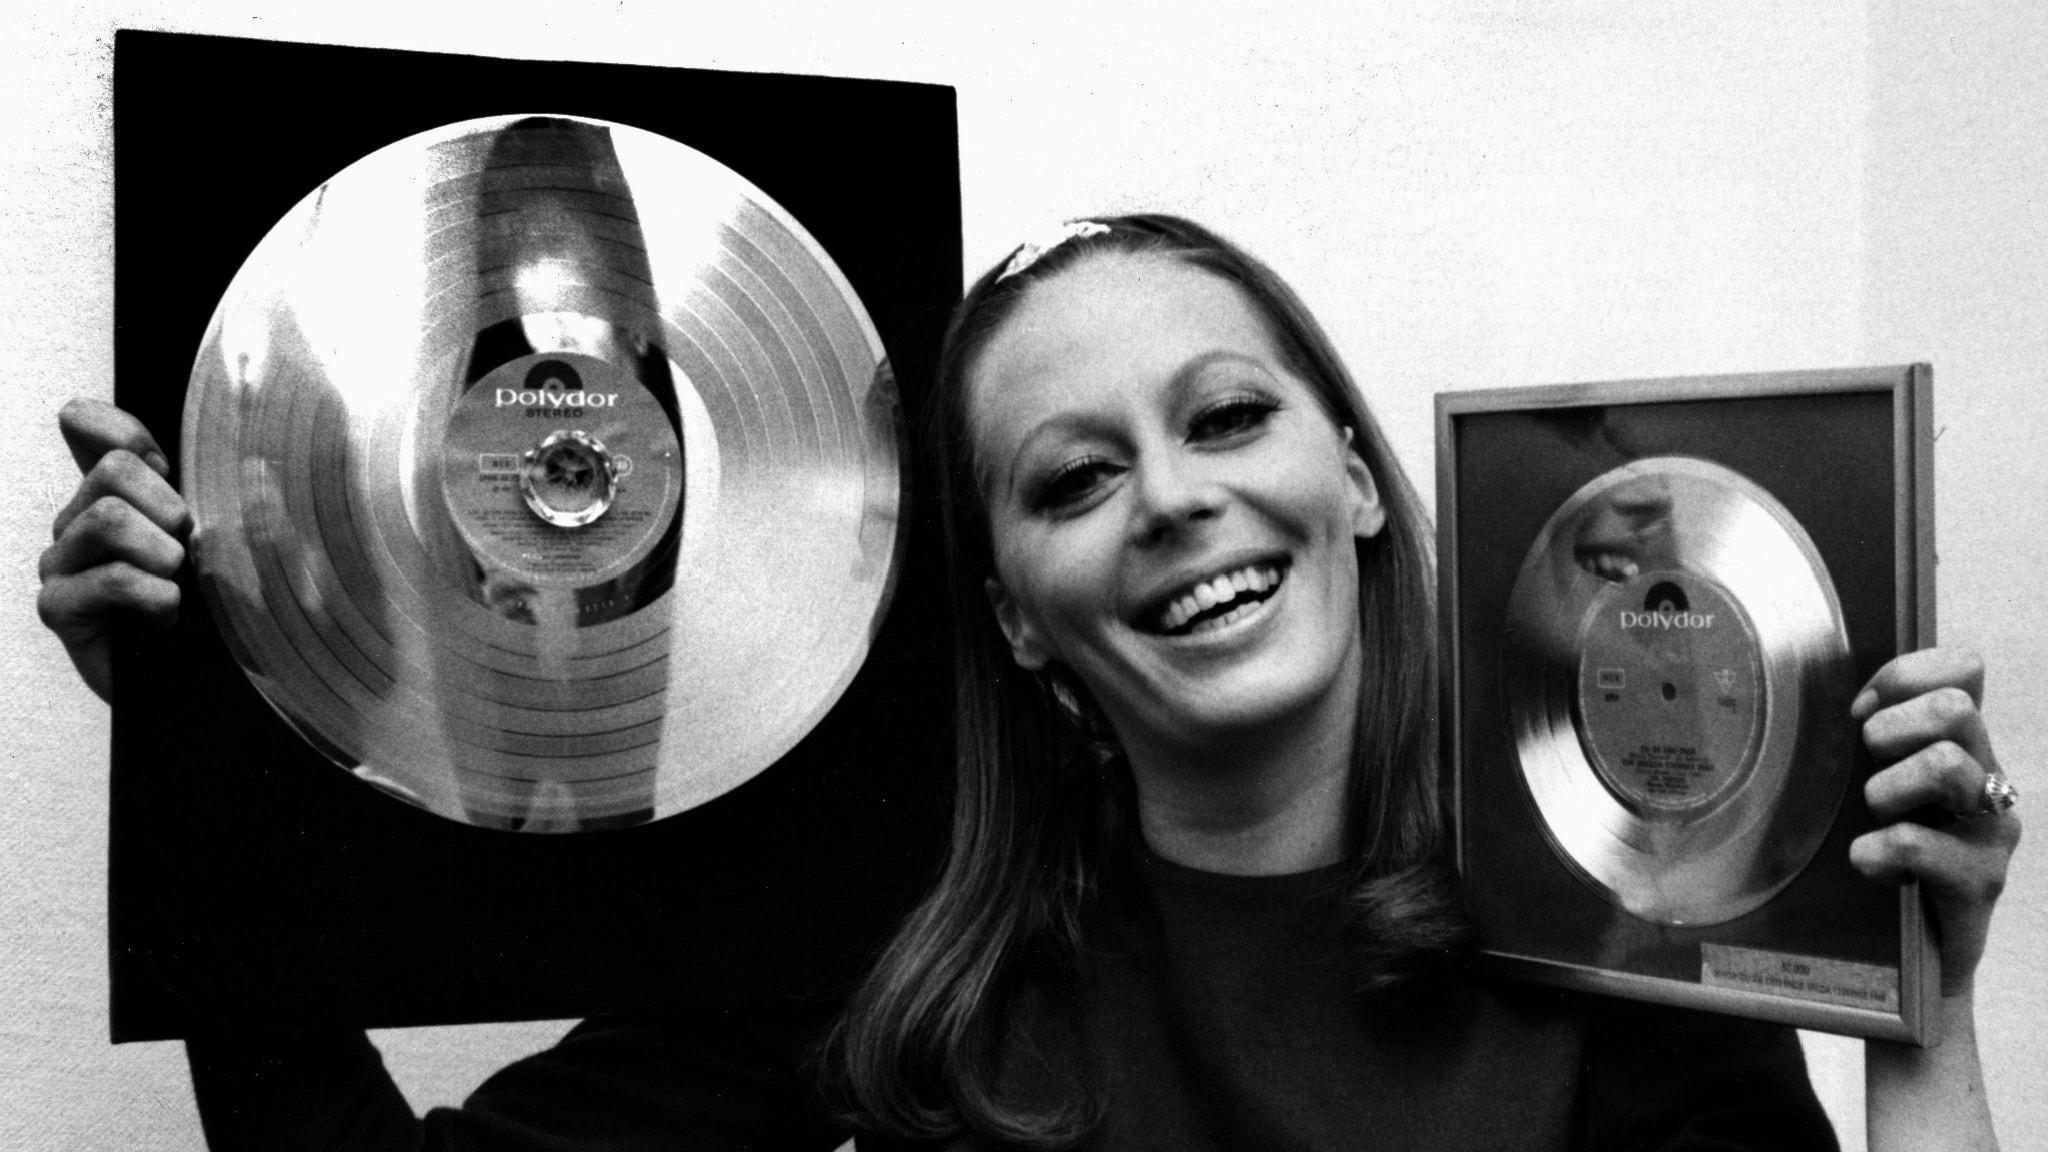 Hör Kvällstoppen från 12 september 1967 med Kerstin Kicki Engerstedt Melinder